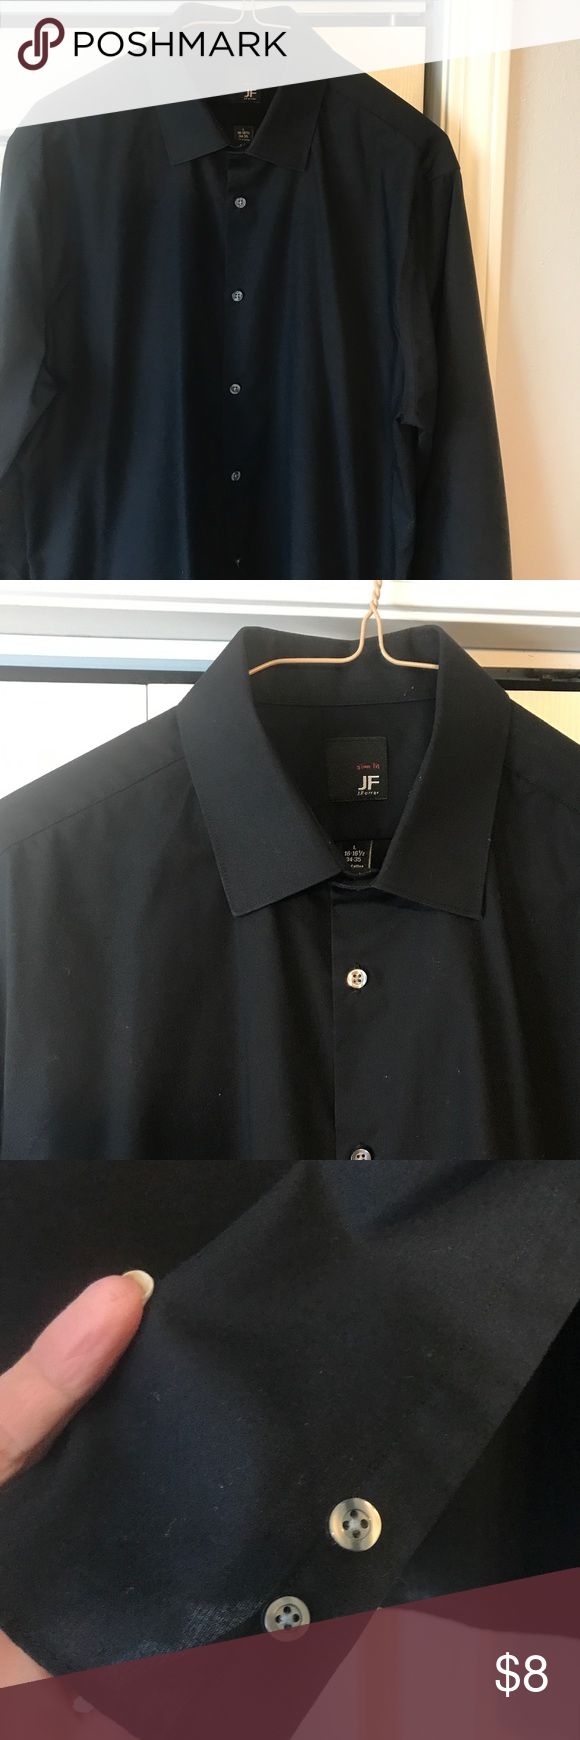 Pict j ferrar modern fit 1 - Men S Slim Fit 16 16 1 2 34 35 Long Sleeve Shirt